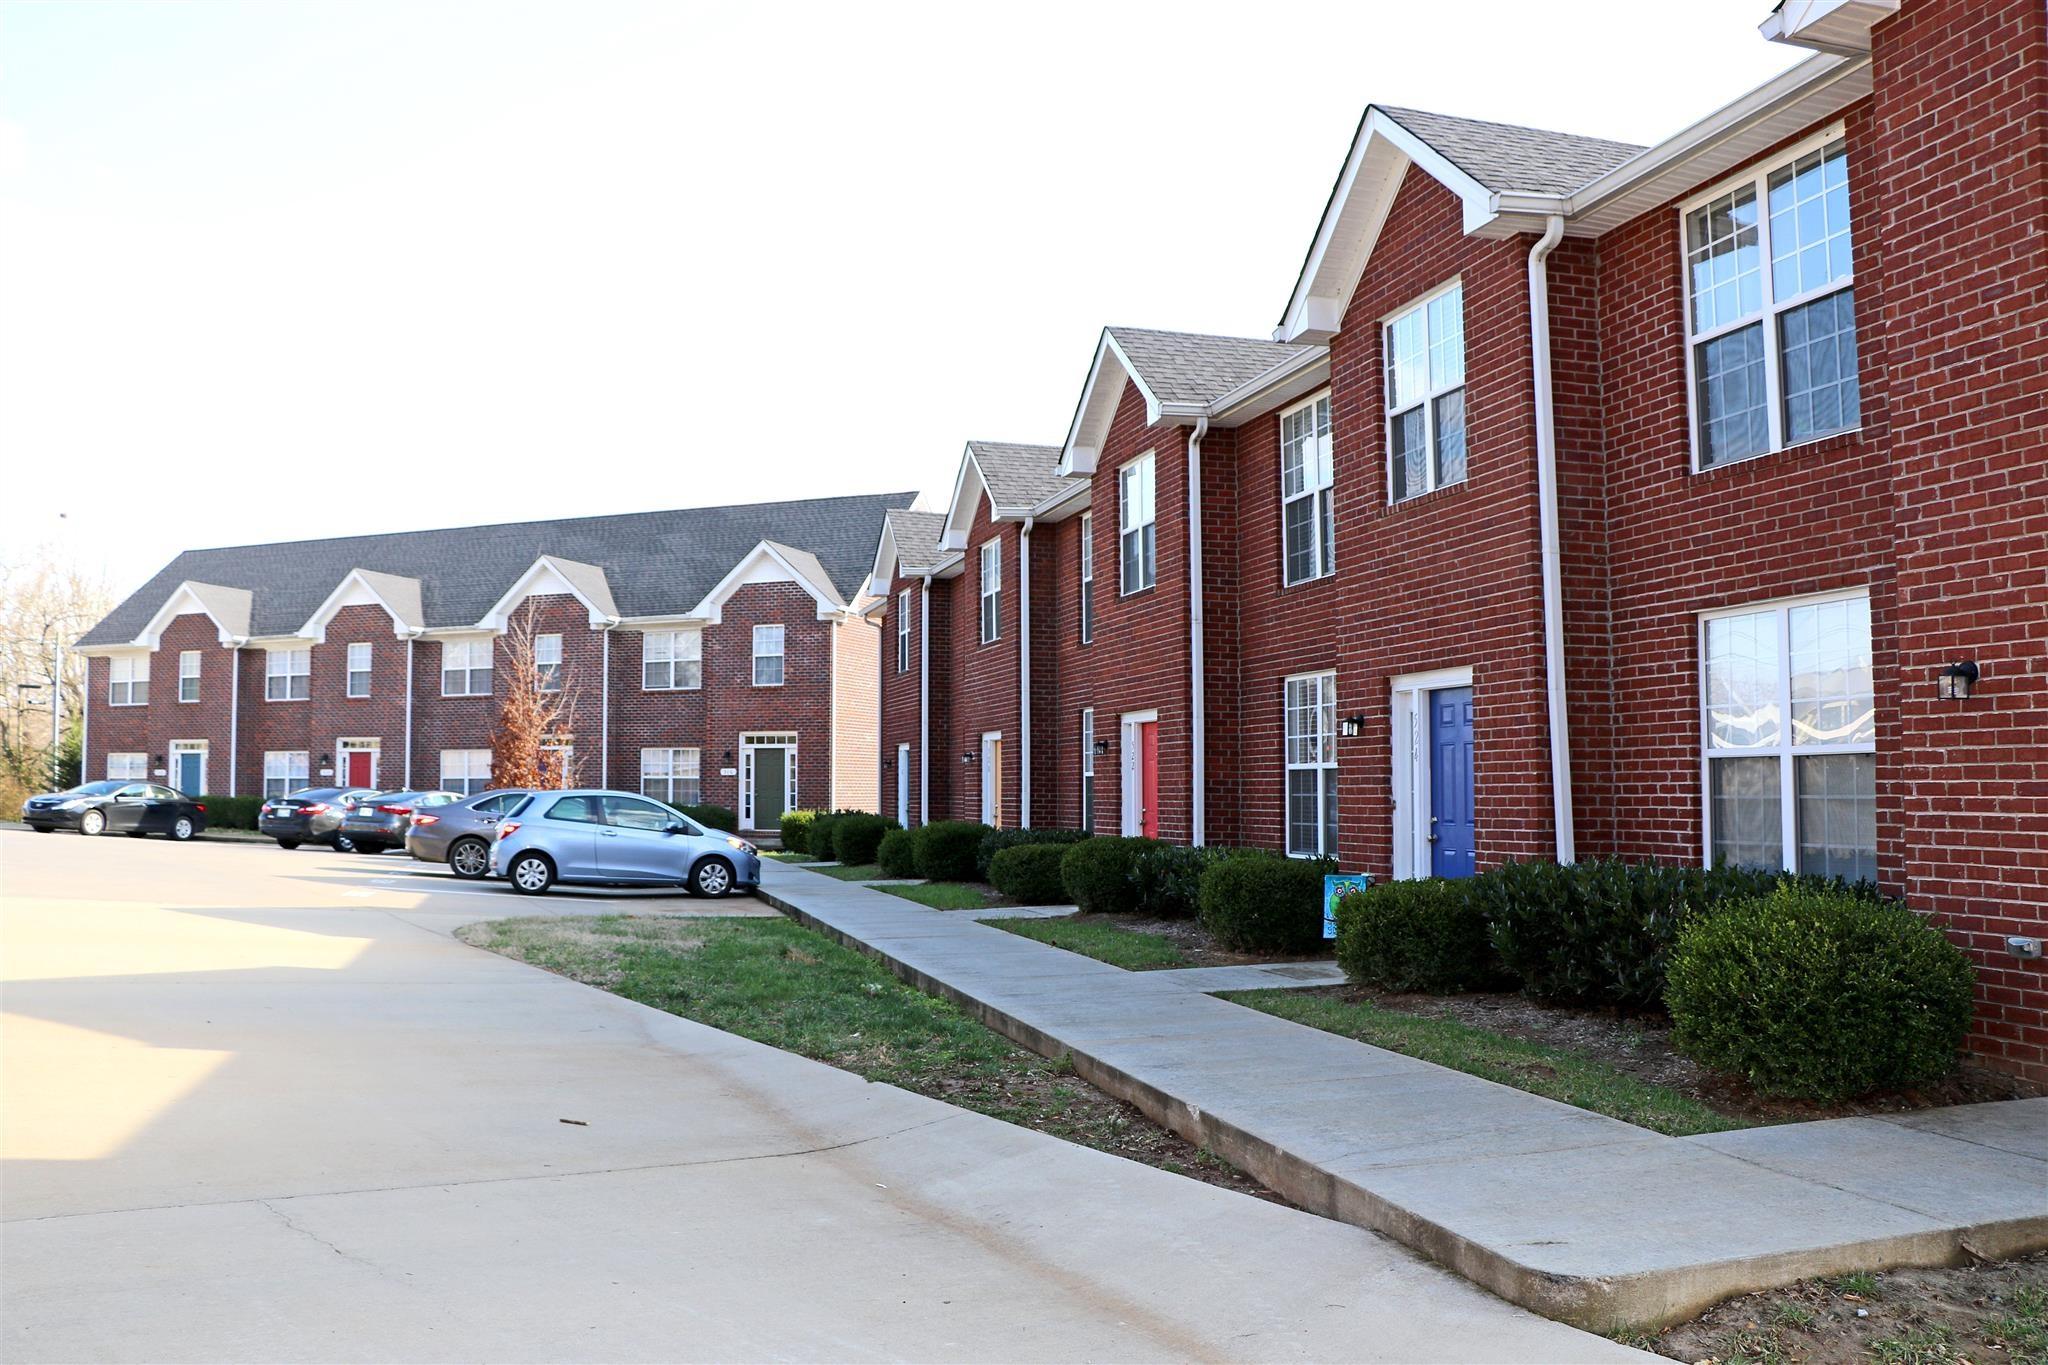 Overlook development clarksville tn nashville home guru for New construction homes in clarksville tn